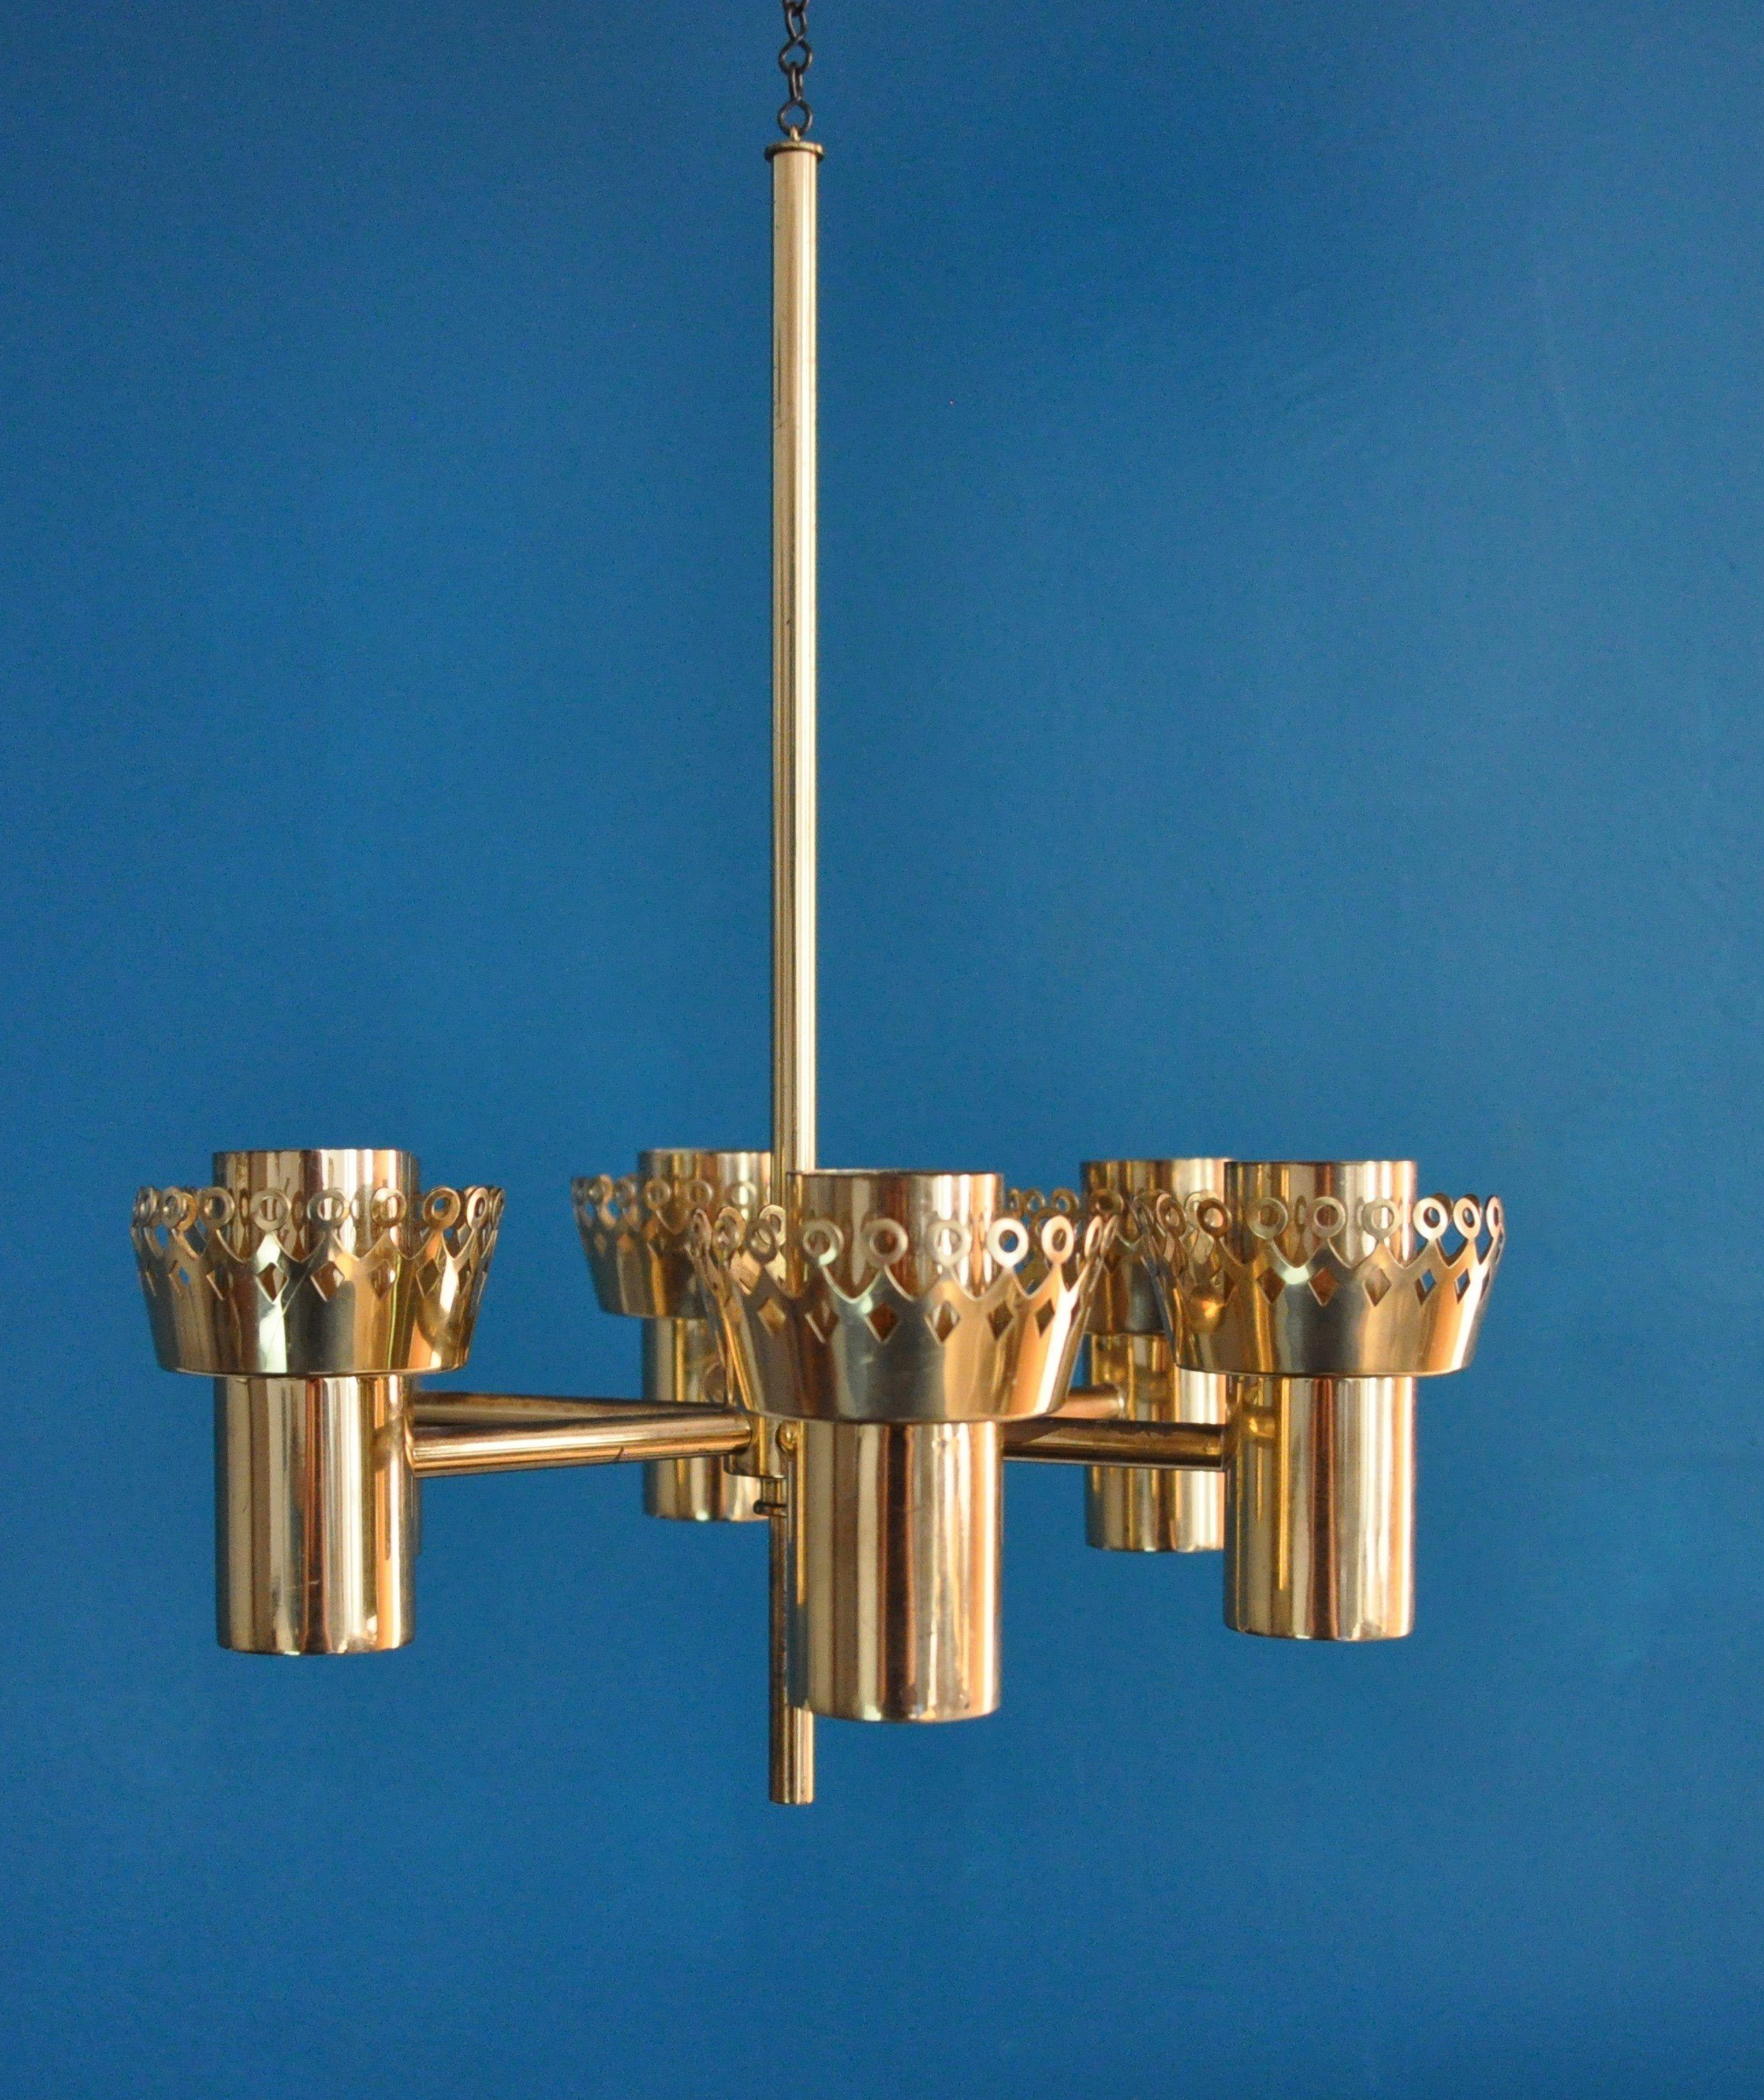 rare-brass-ceiling-candle-lamp-hans-agne-jakobsson-sweden1.jpg